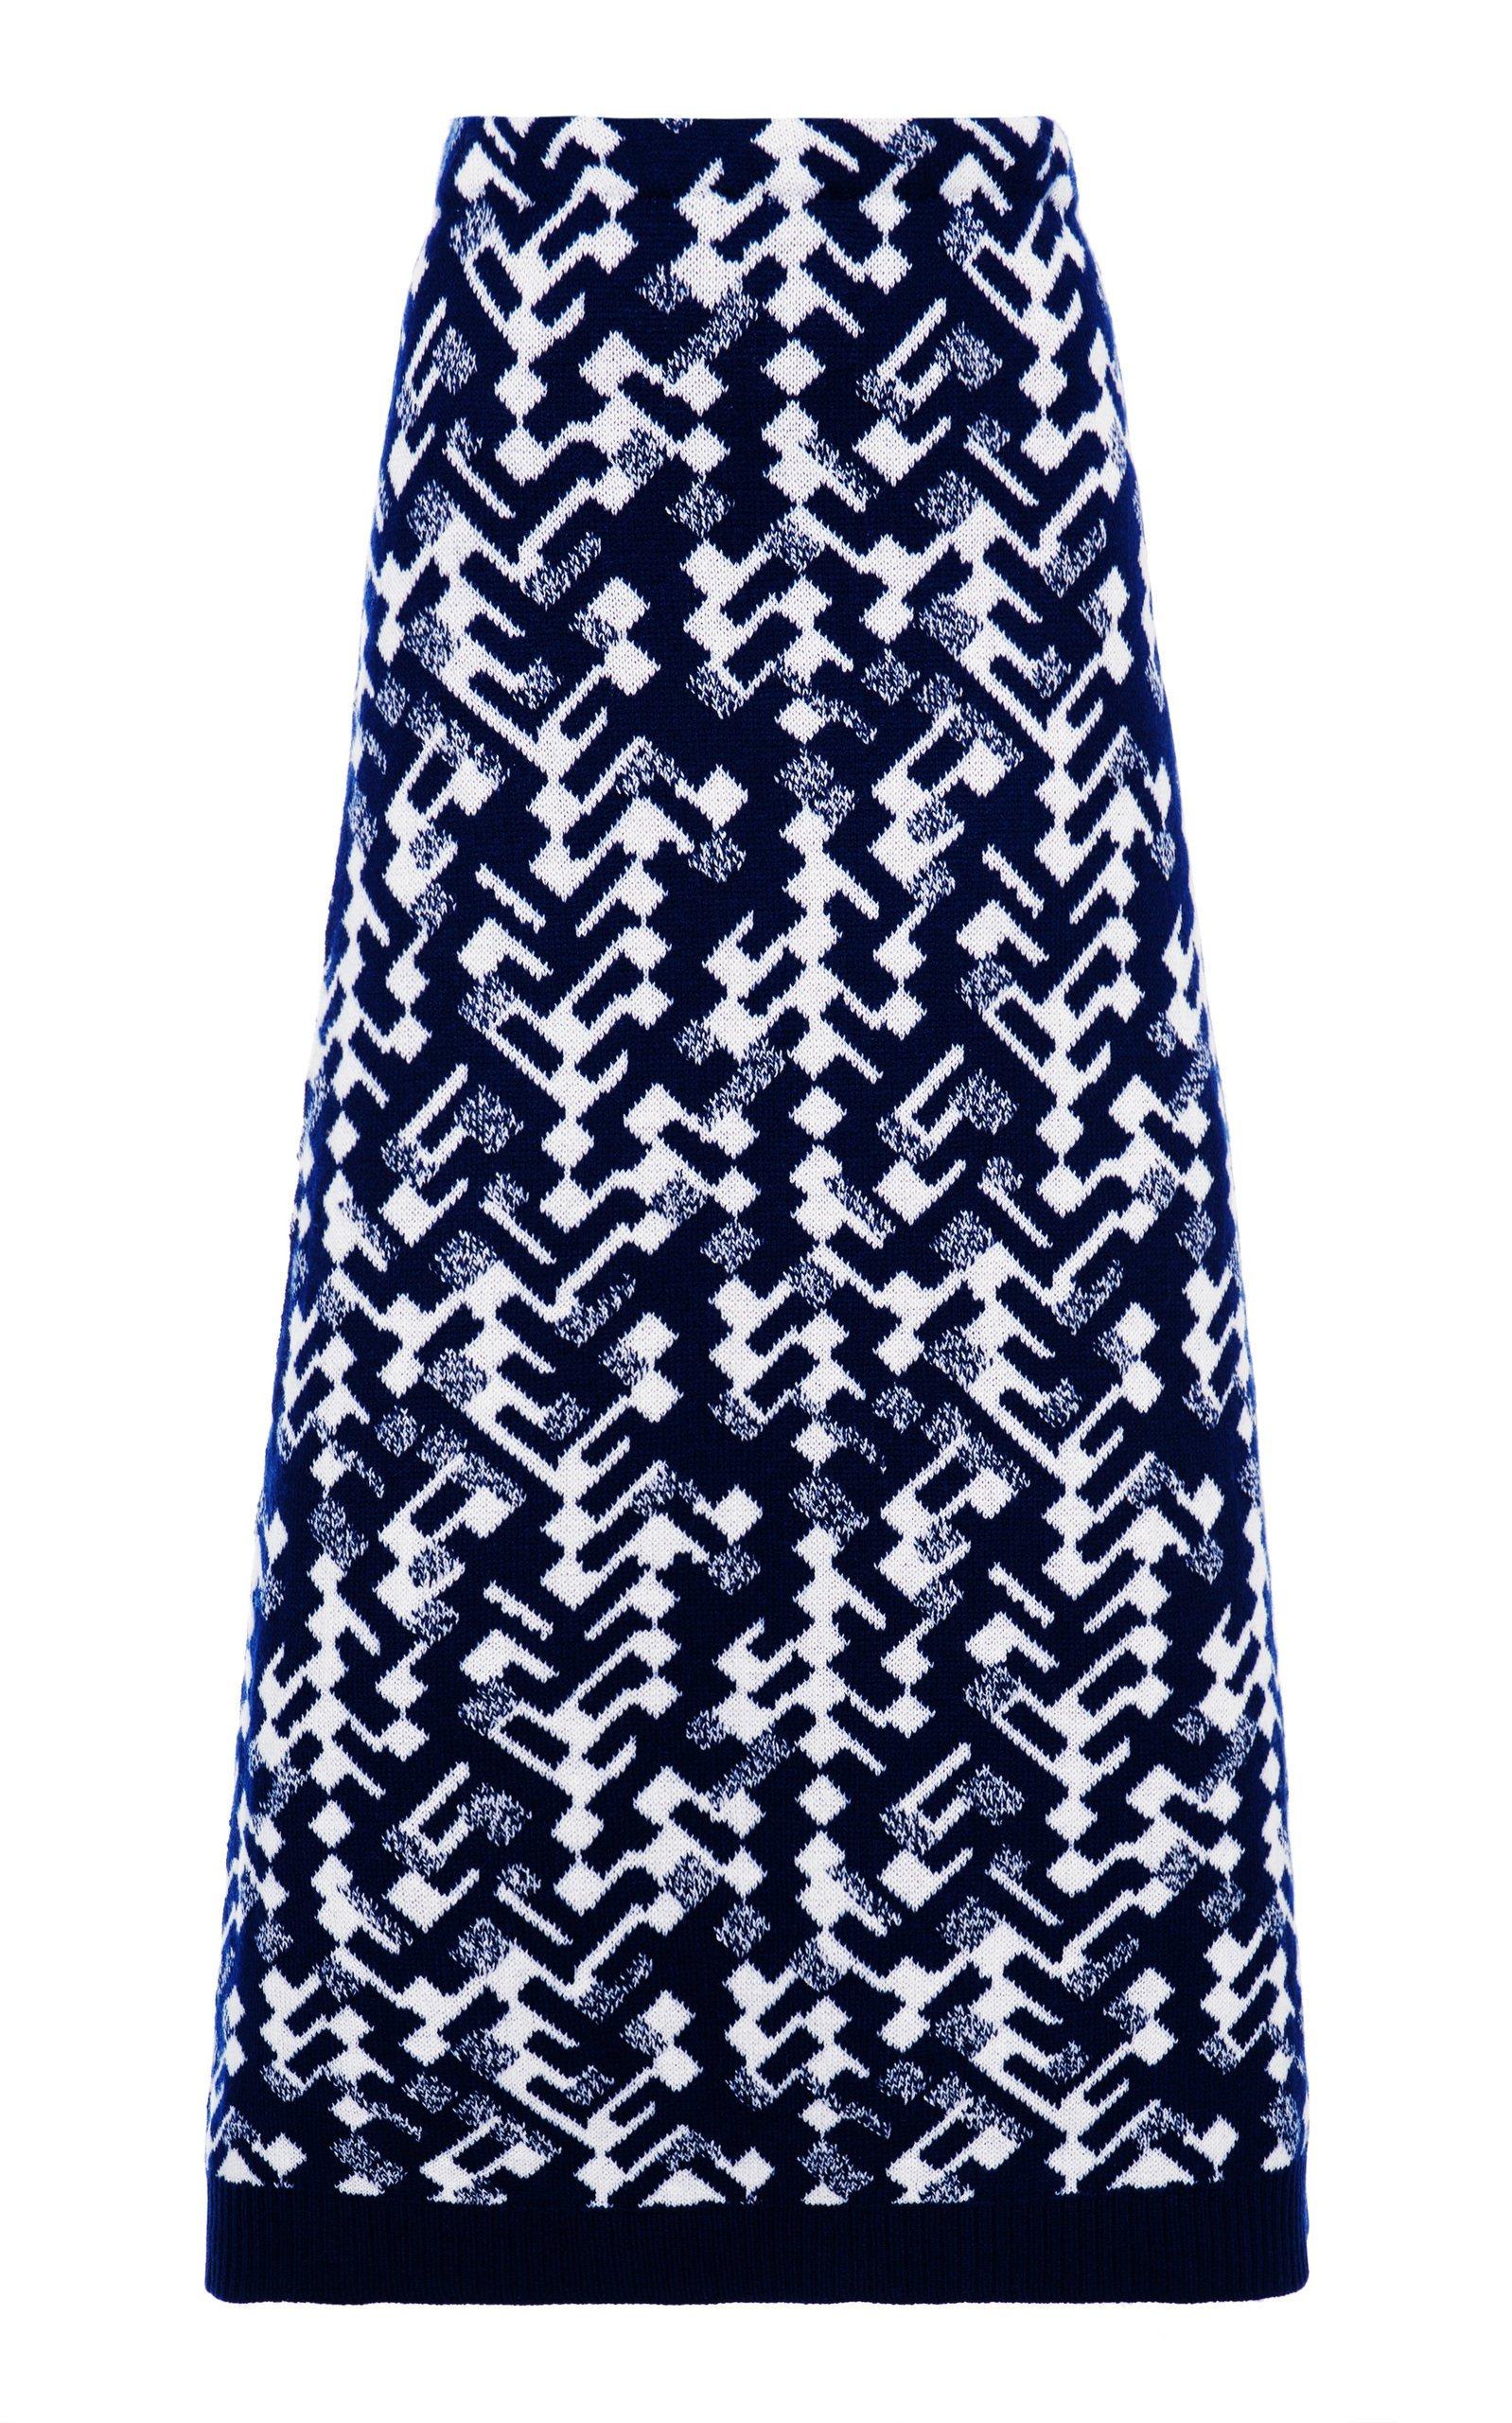 Prada Printed Cashmere Midi Skirt Size: 42